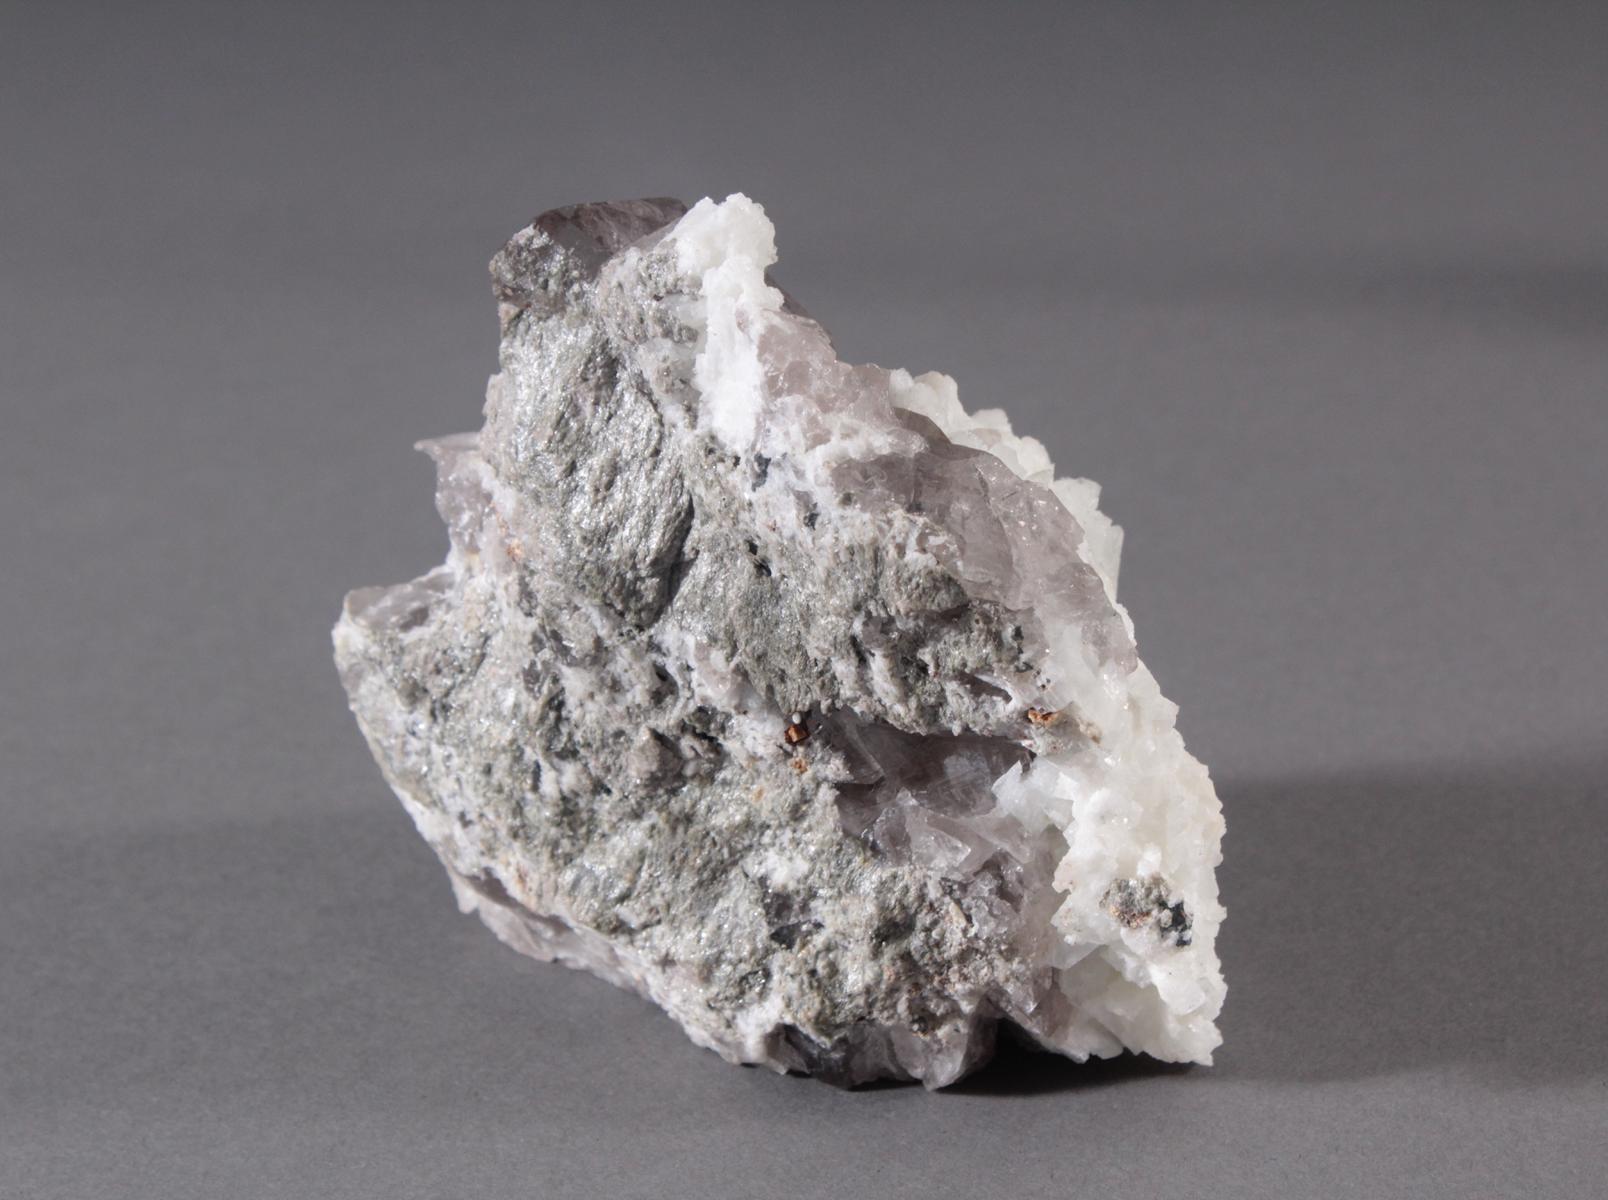 Rauchquarz-Faden-Ketten-Adular-Hämatit-Rutil-Siderit-2